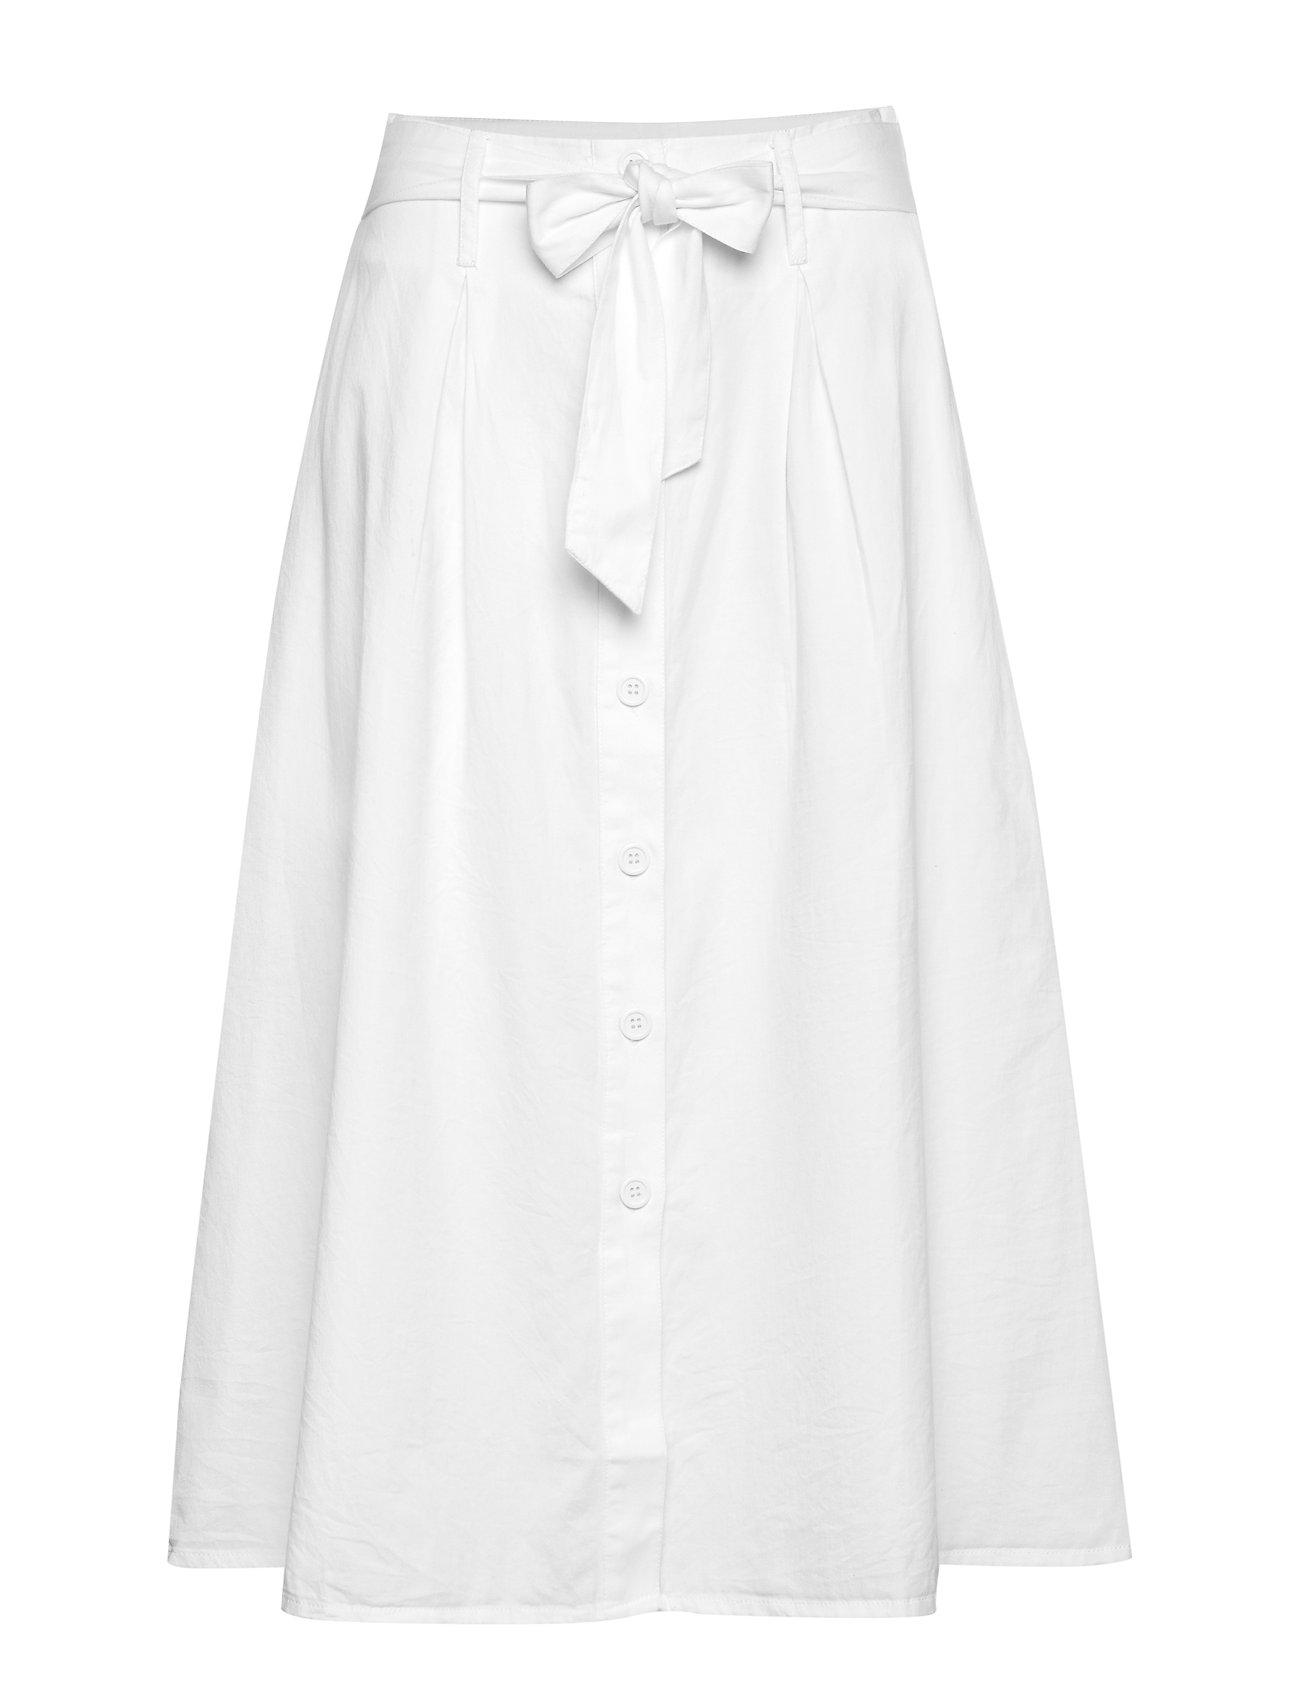 nué notes Geneve Skirt - WHITE